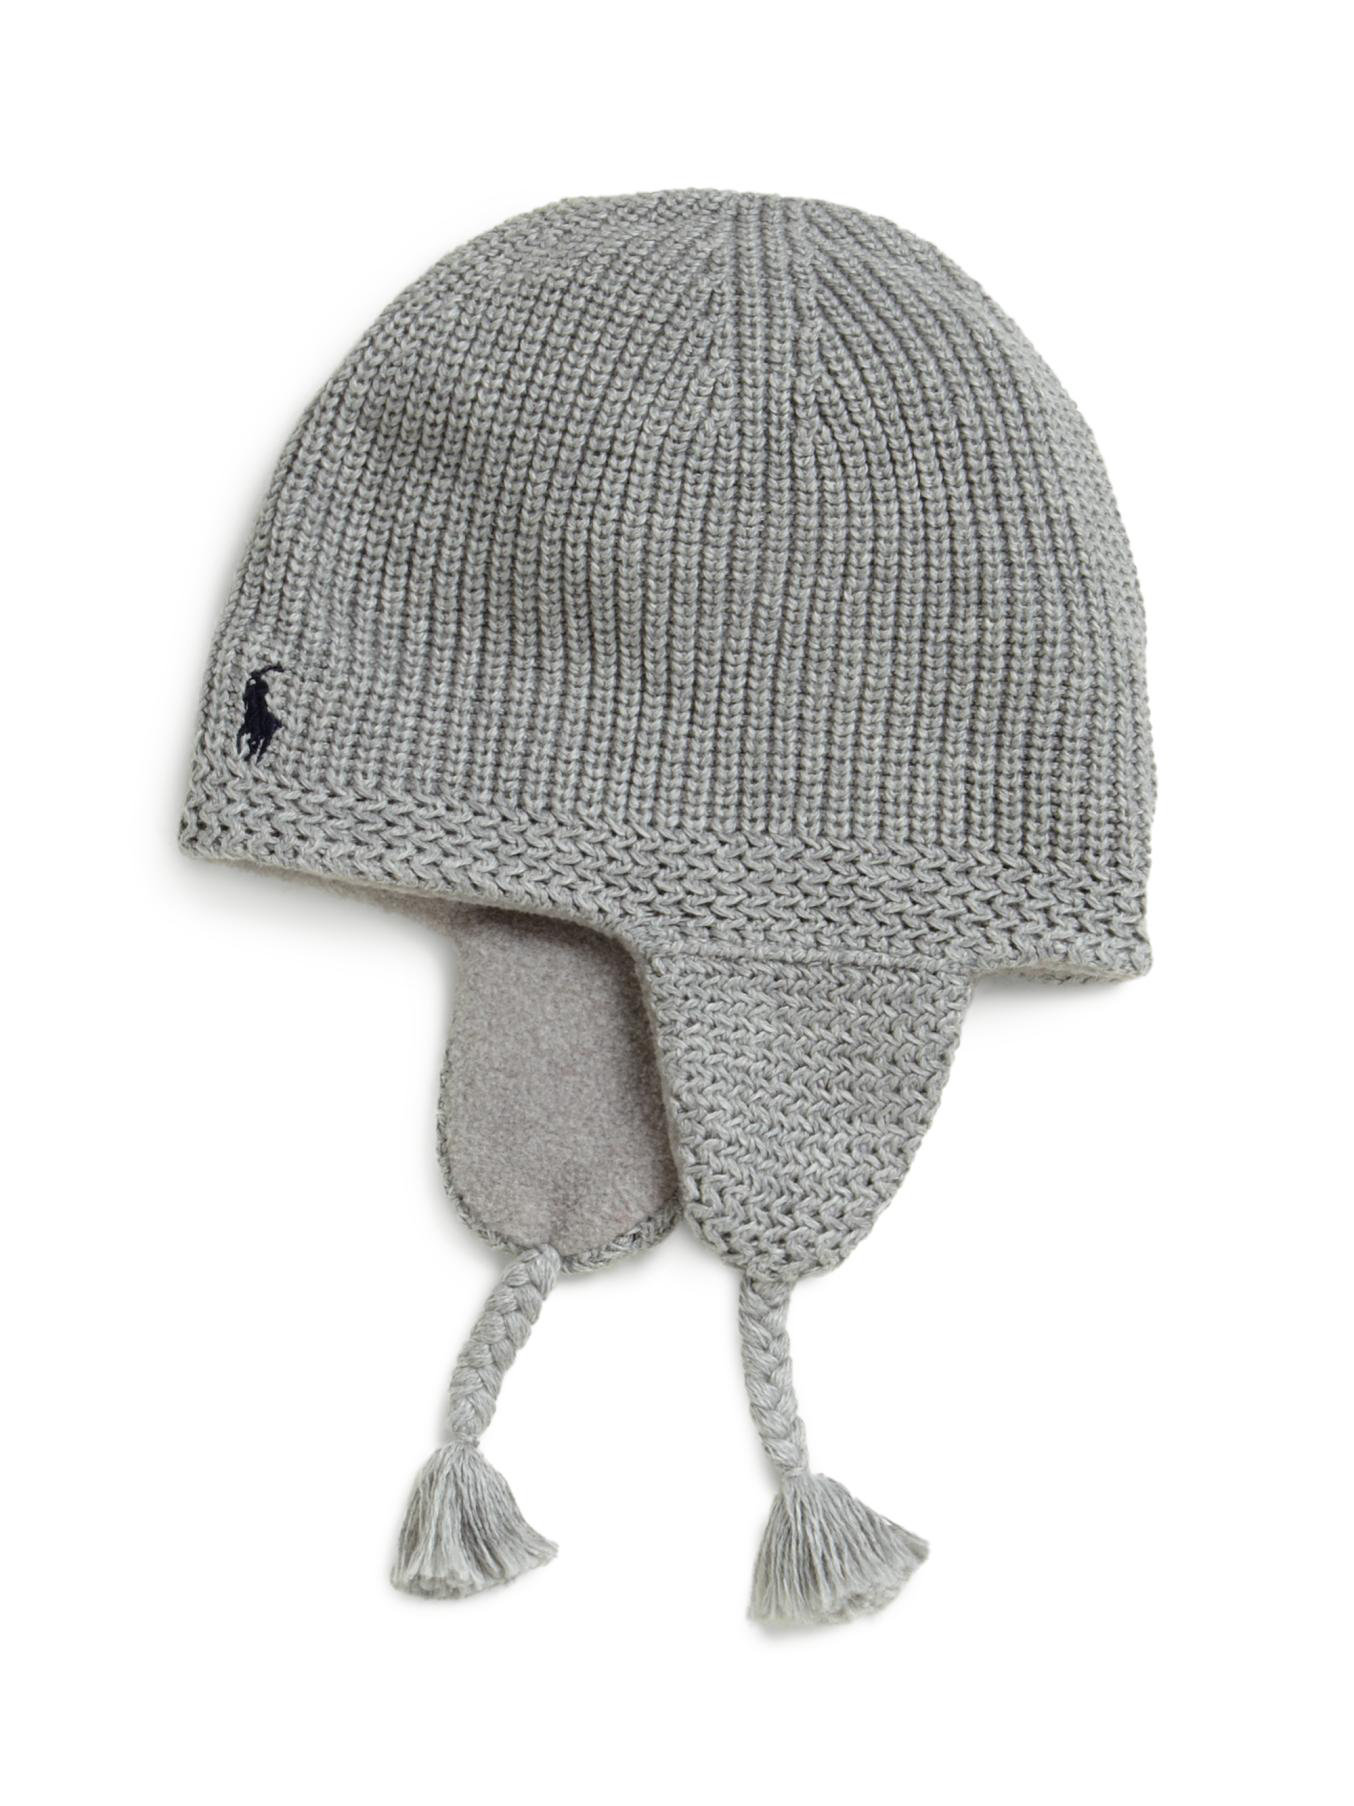 3693d79d527 Lyst - Ralph Lauren Toddler Boys Knit Earflap Hat in Gray for Men